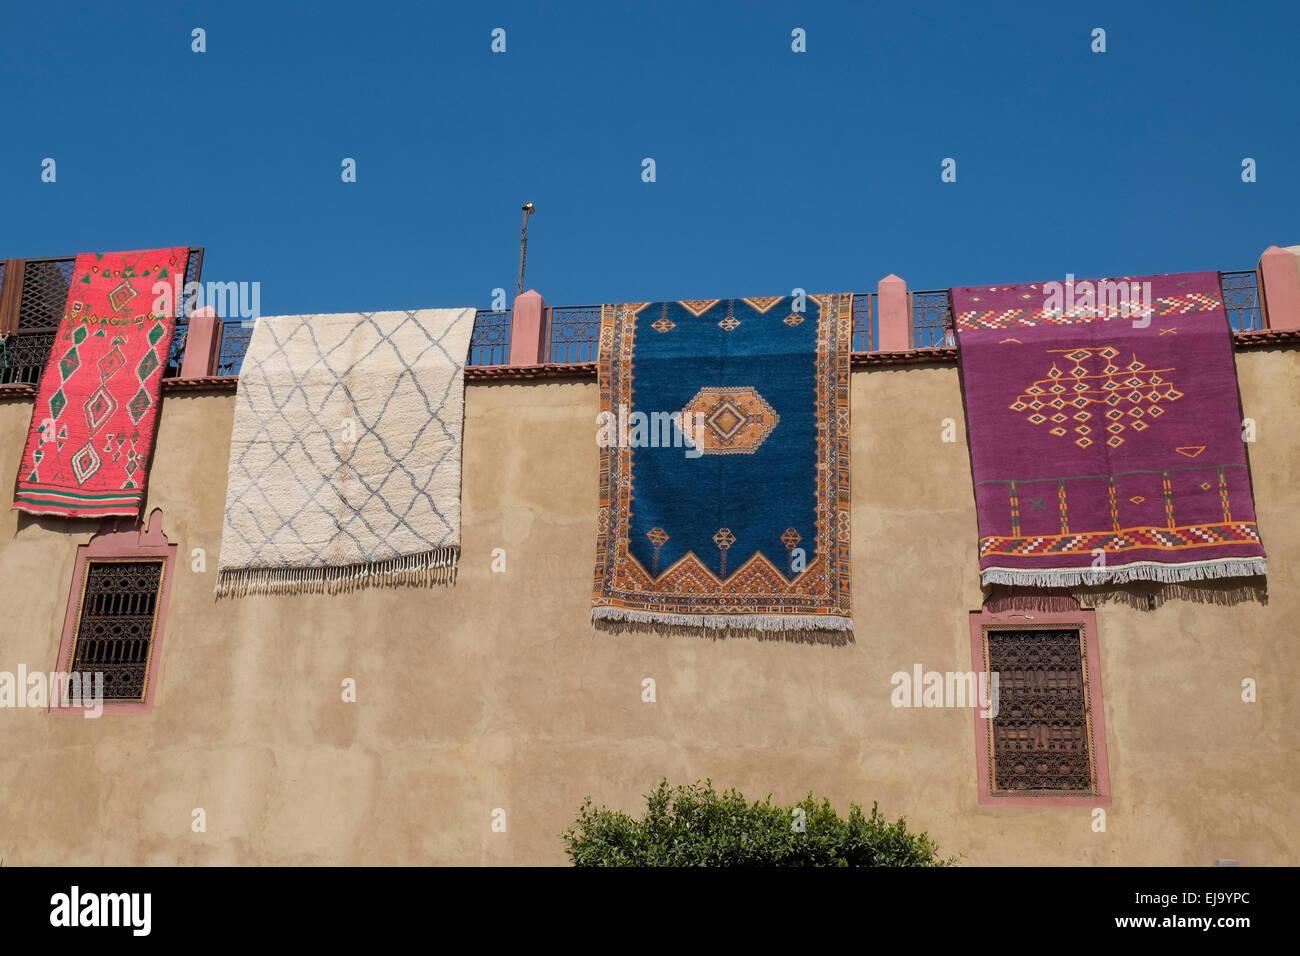 Hanging Rugs Hanging Rugs Stock Photos Hanging Rugs Stock Images Alamy